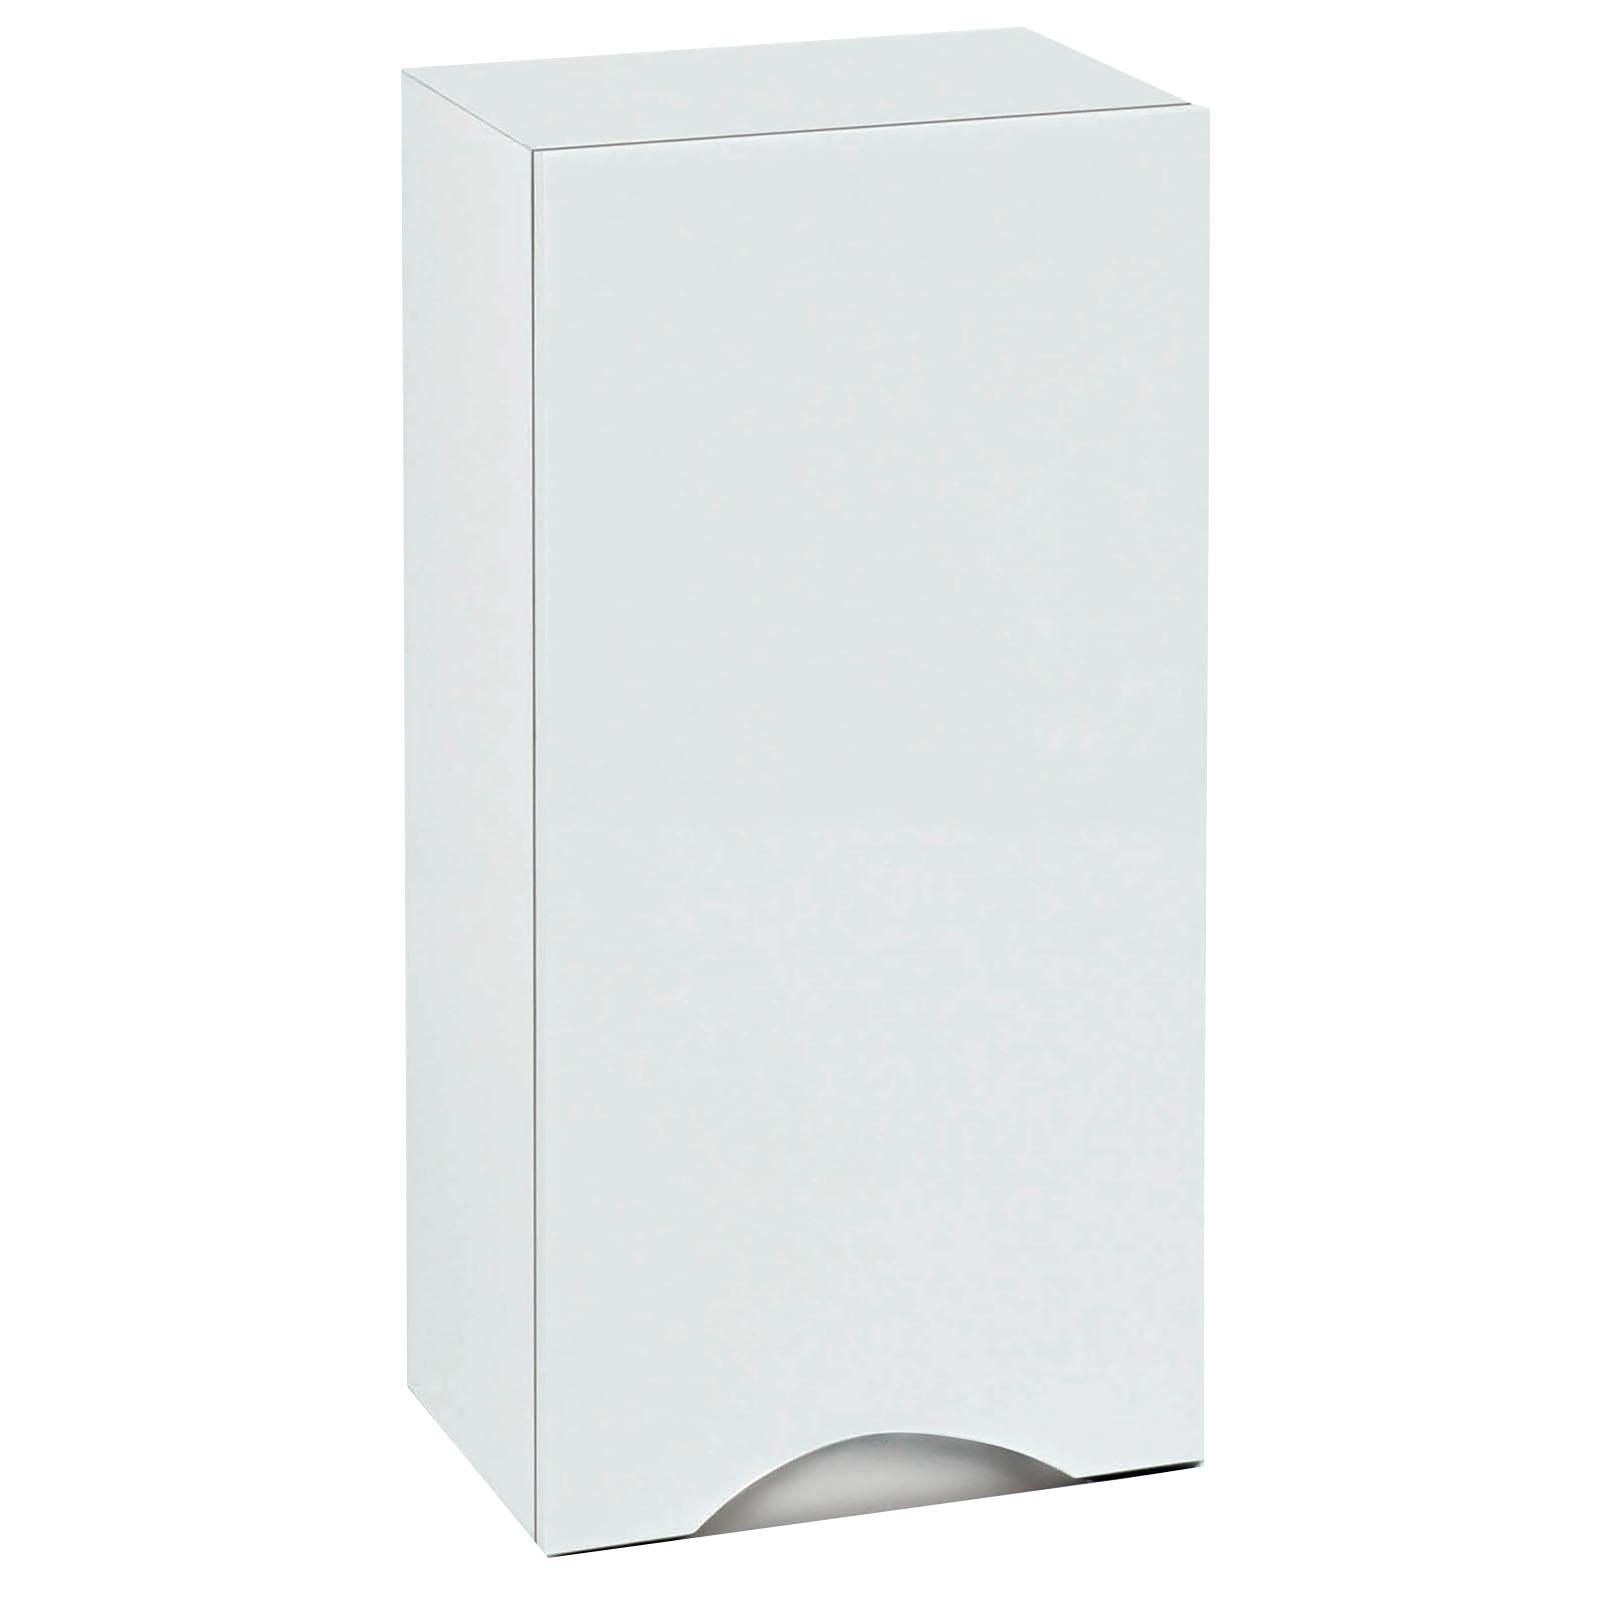 phoenix bathrooms 35 wall mounted storage unit white. Black Bedroom Furniture Sets. Home Design Ideas